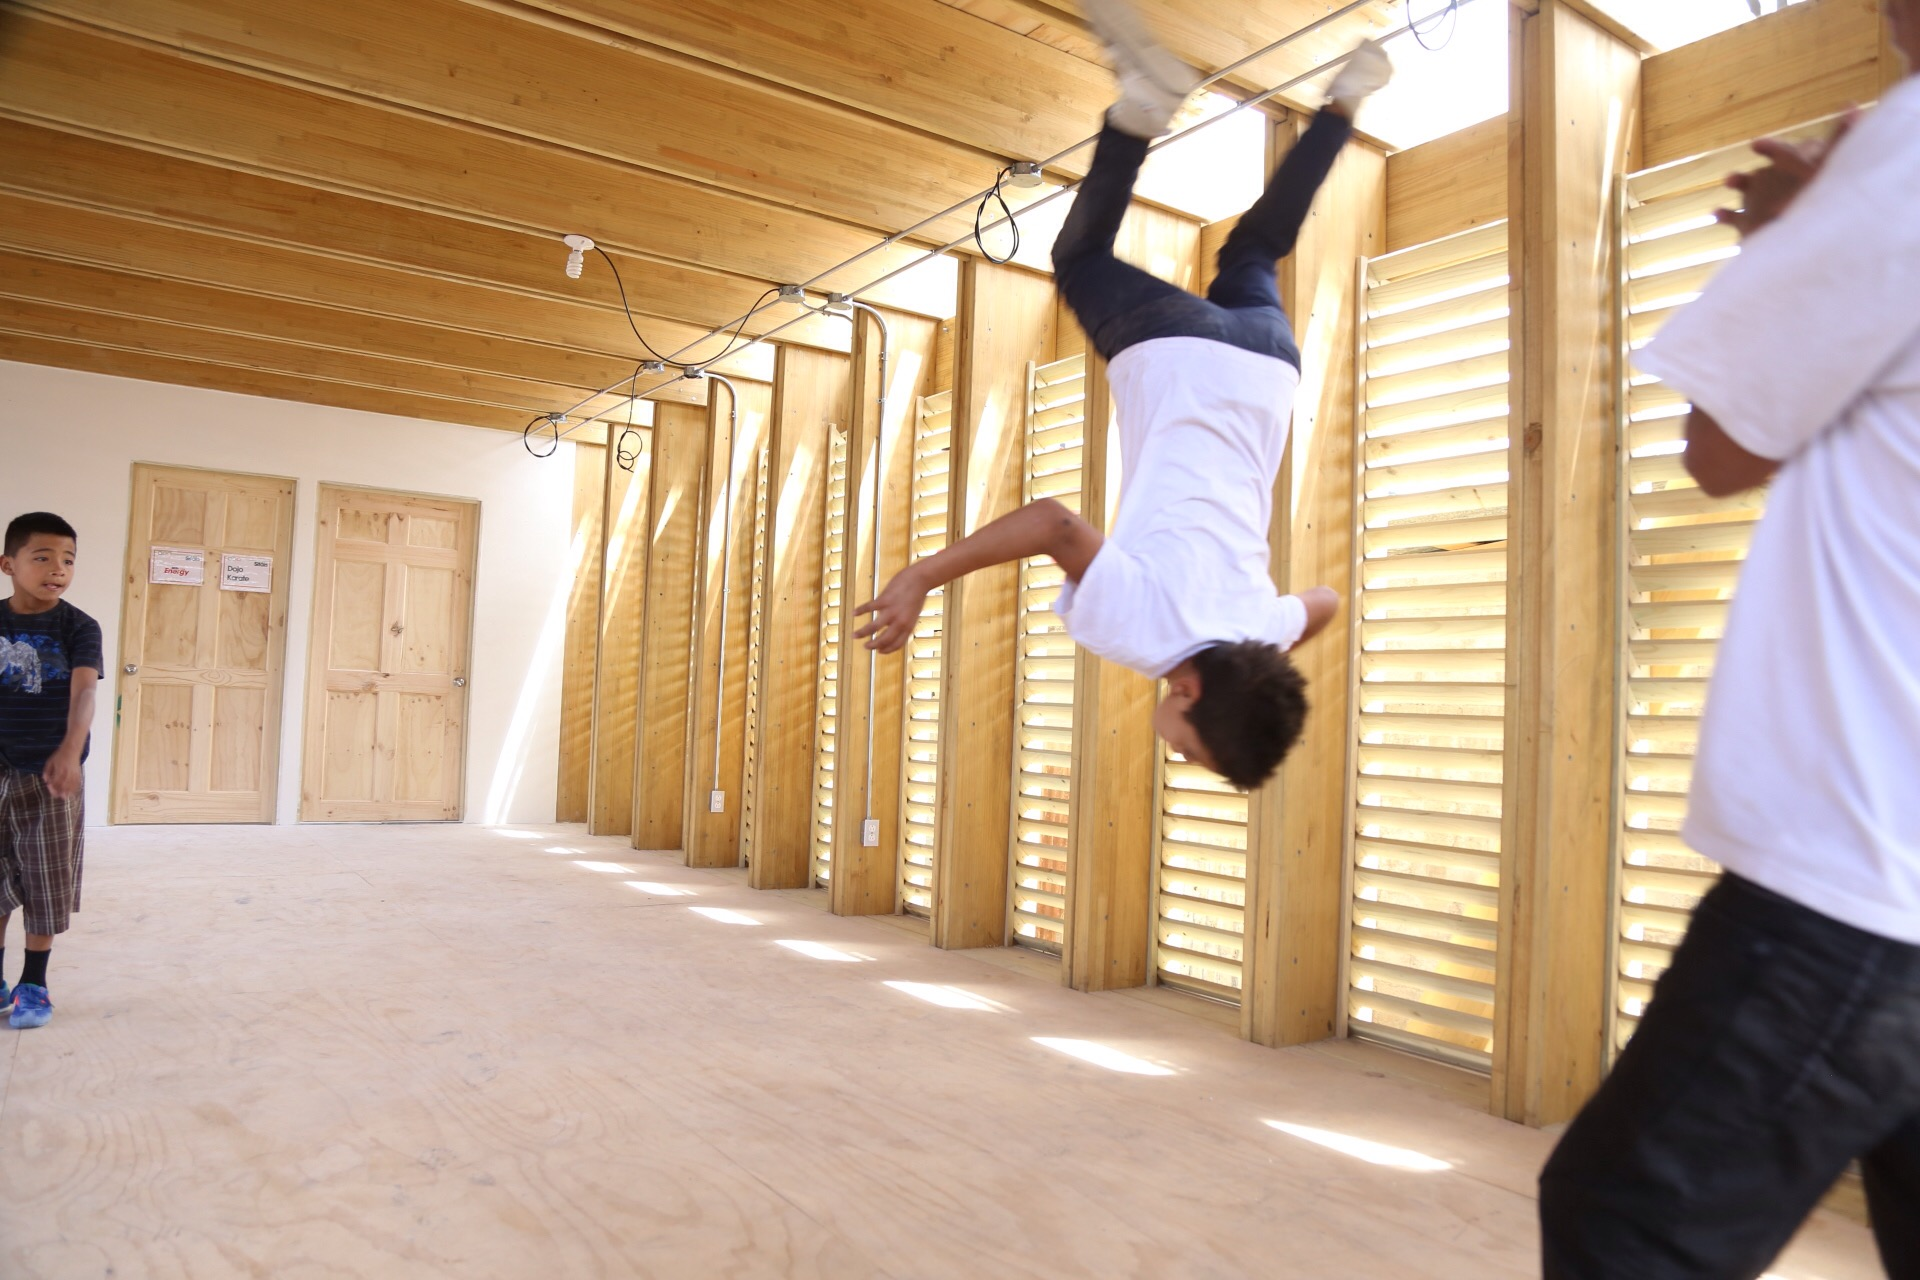 Breake Dance SIFAIS